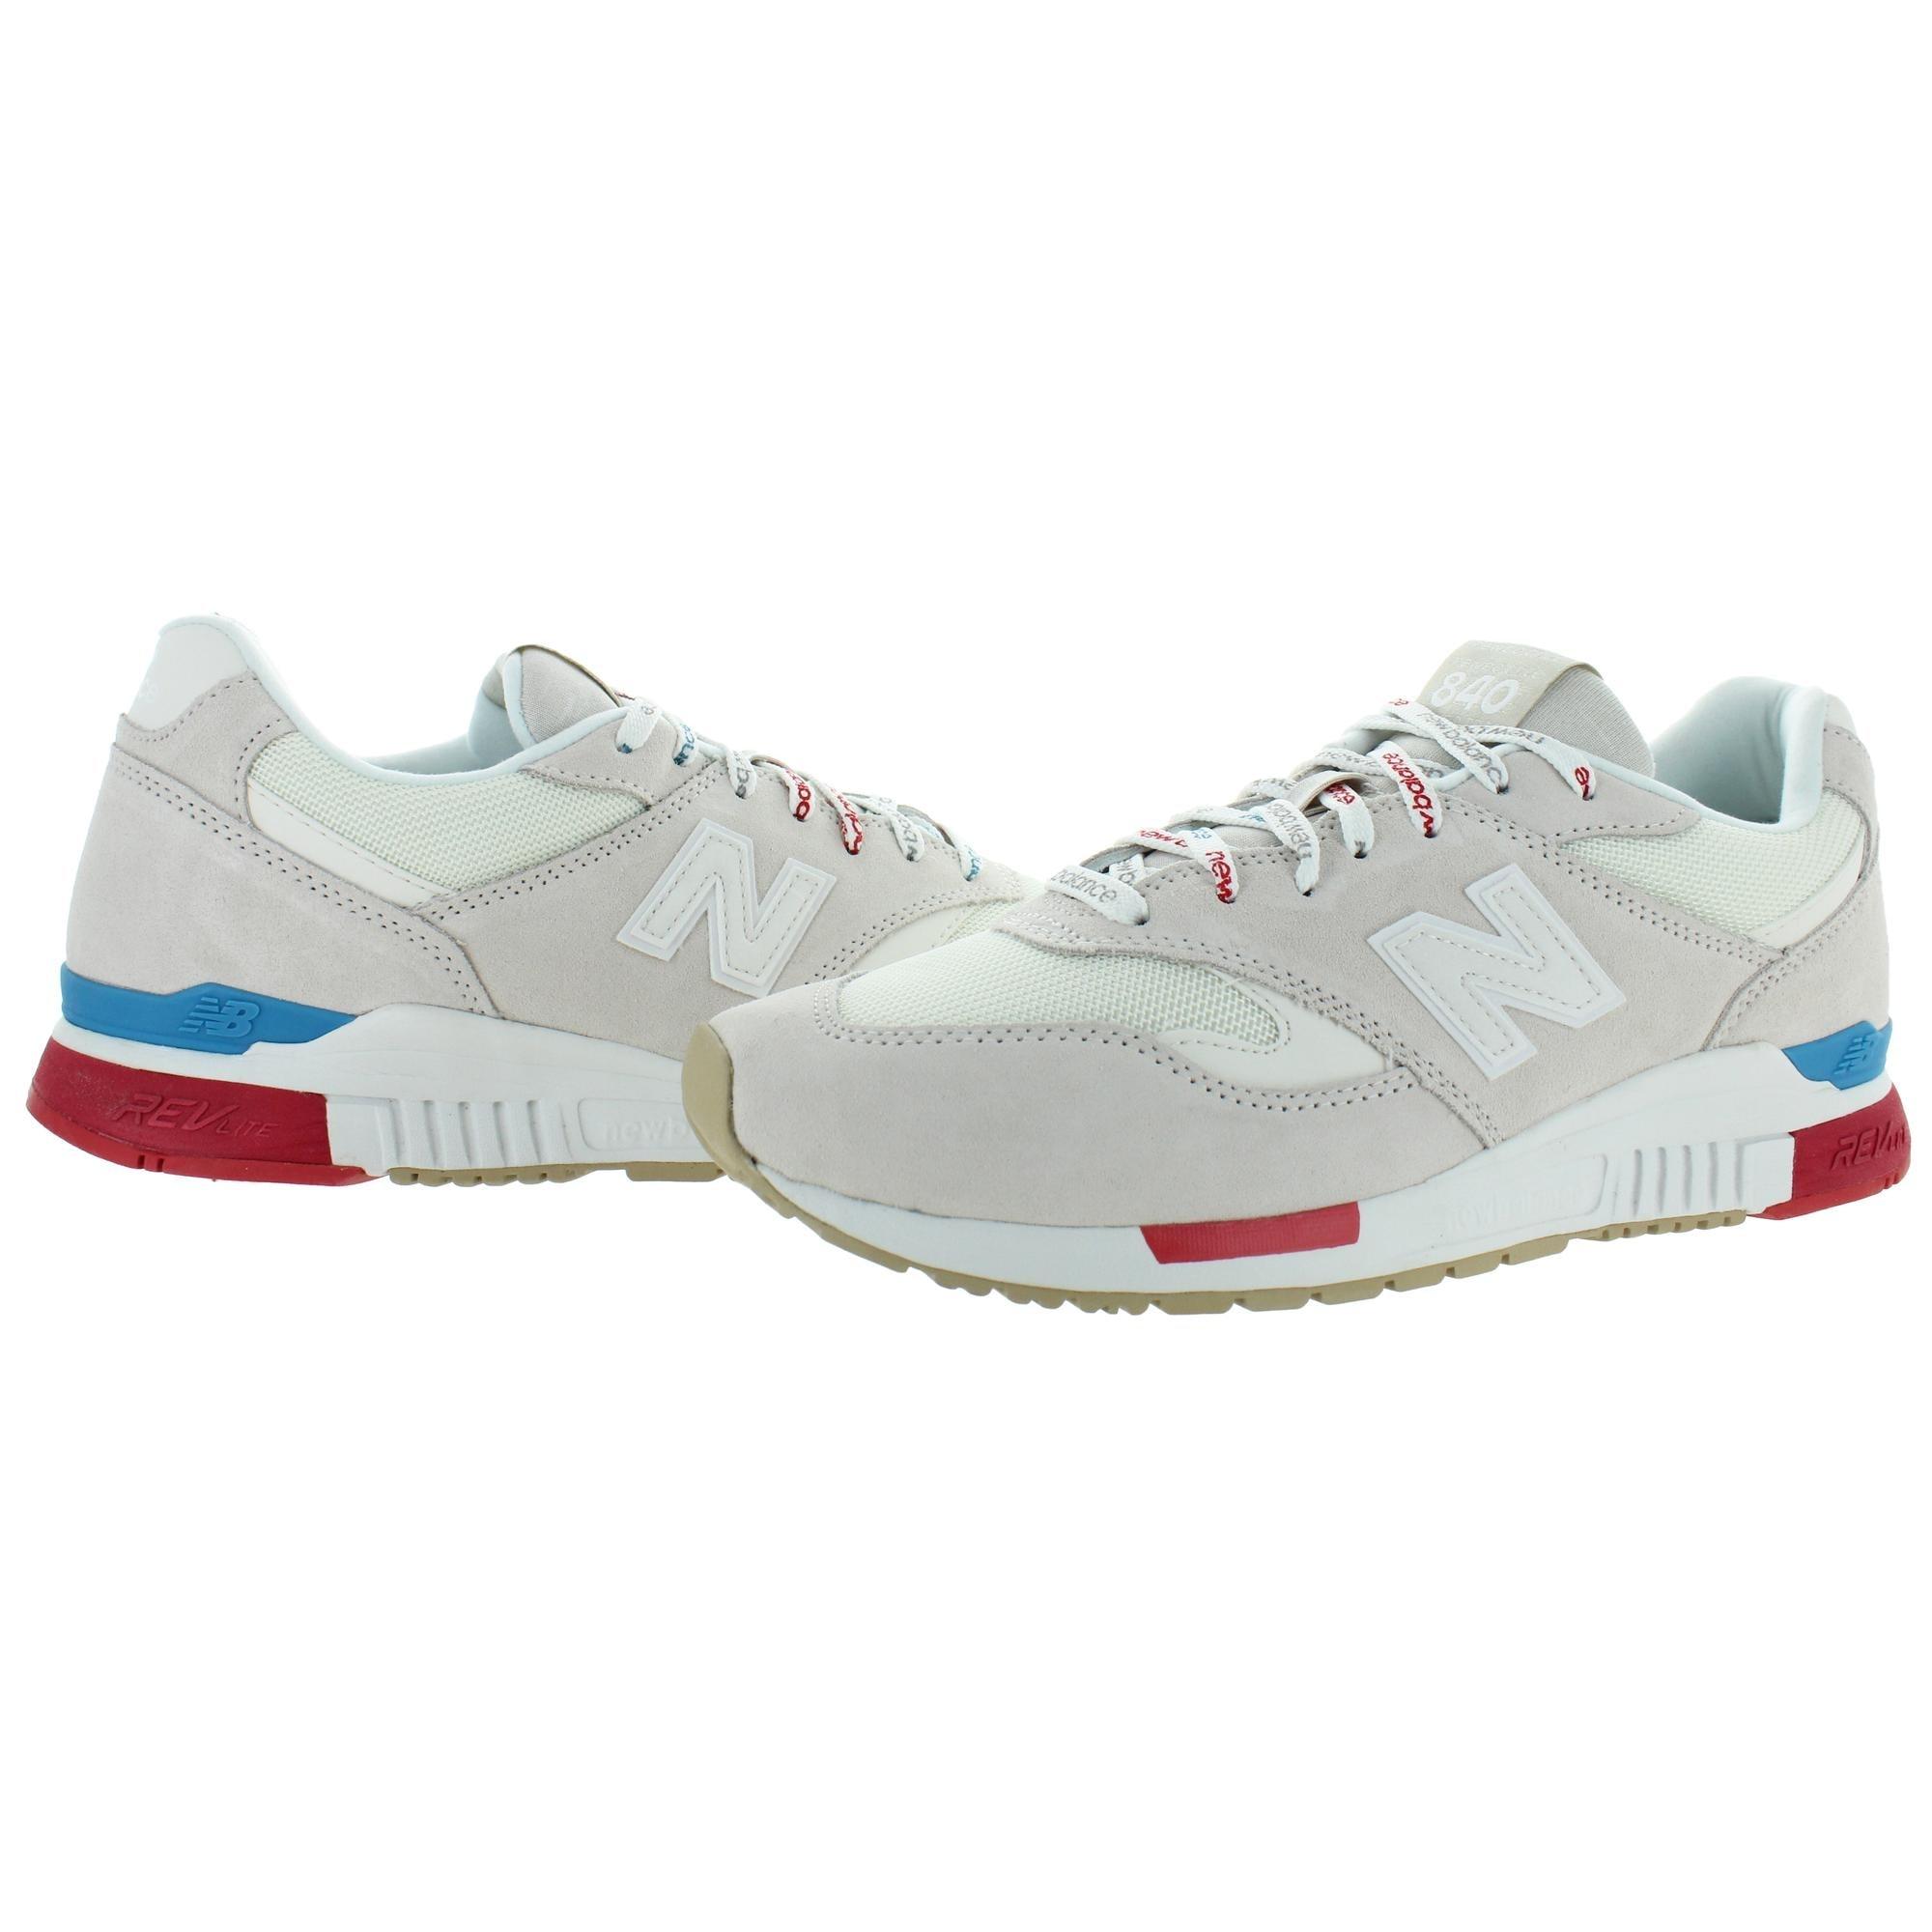 New Balance Womens 840 Sneakers Trainers REVlite - Beige/Red/Blue - 12 Medium (B,M)